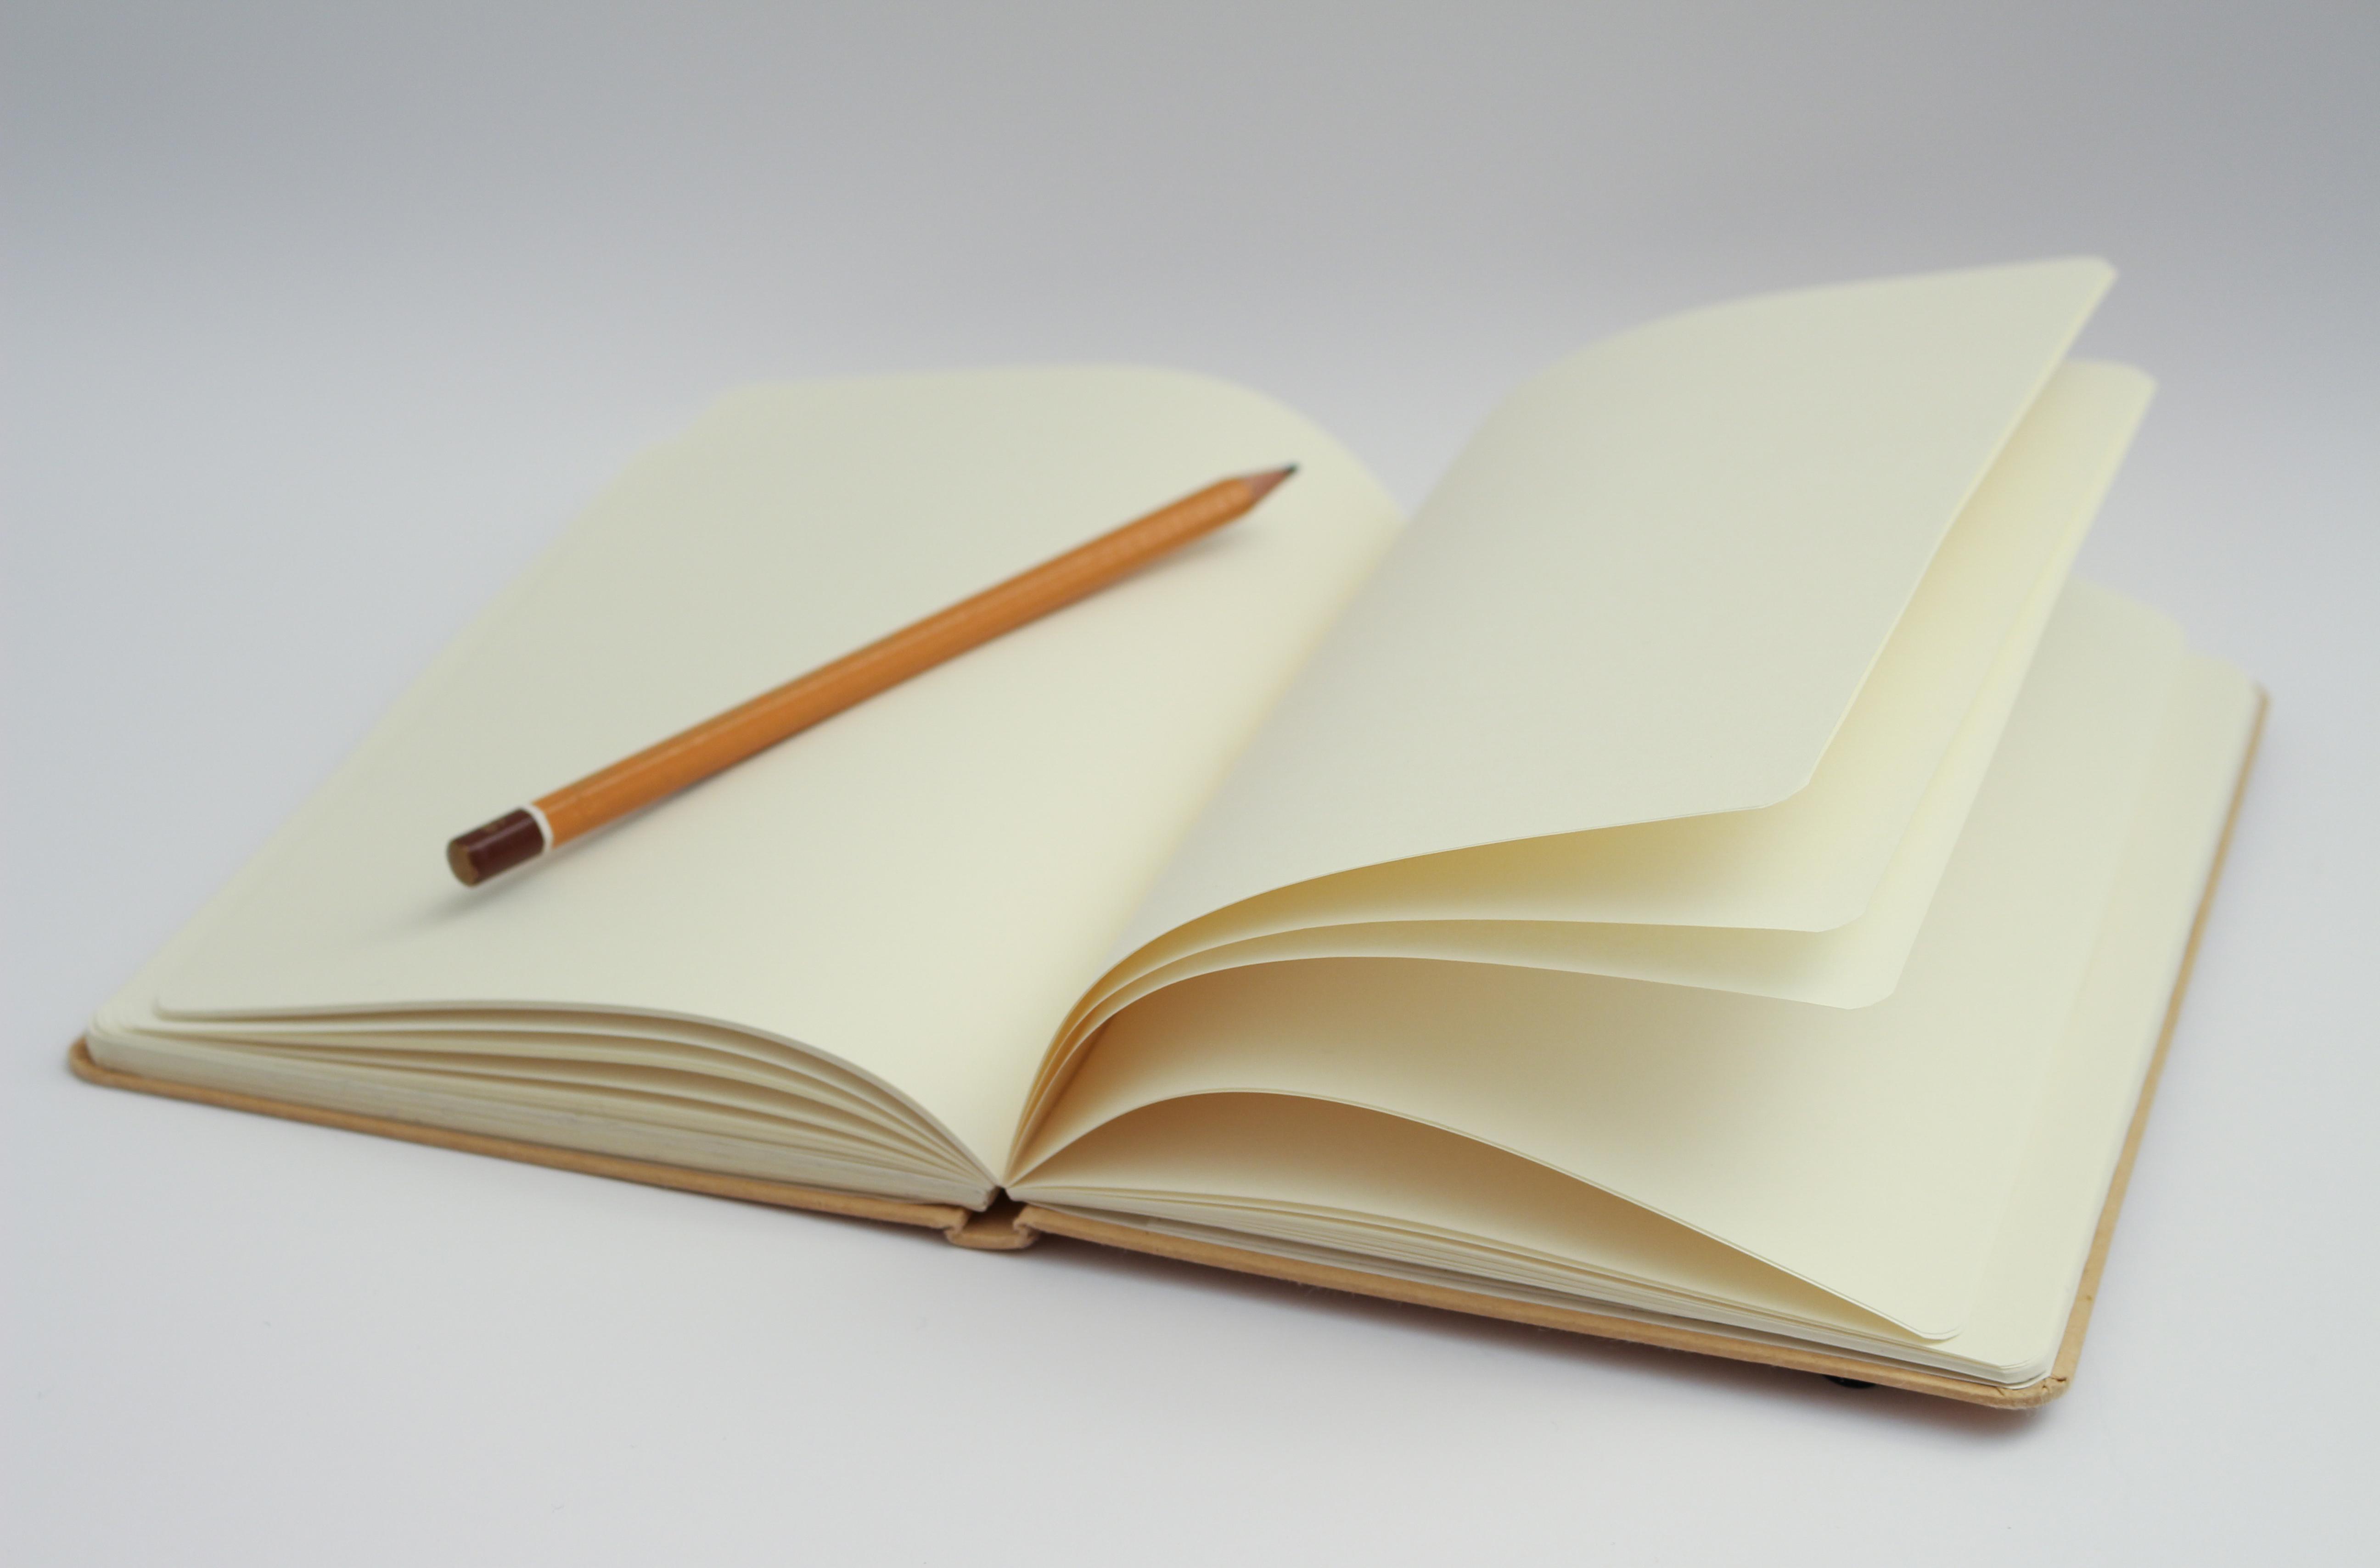 book pencil the friends of thomas branigan memorial library